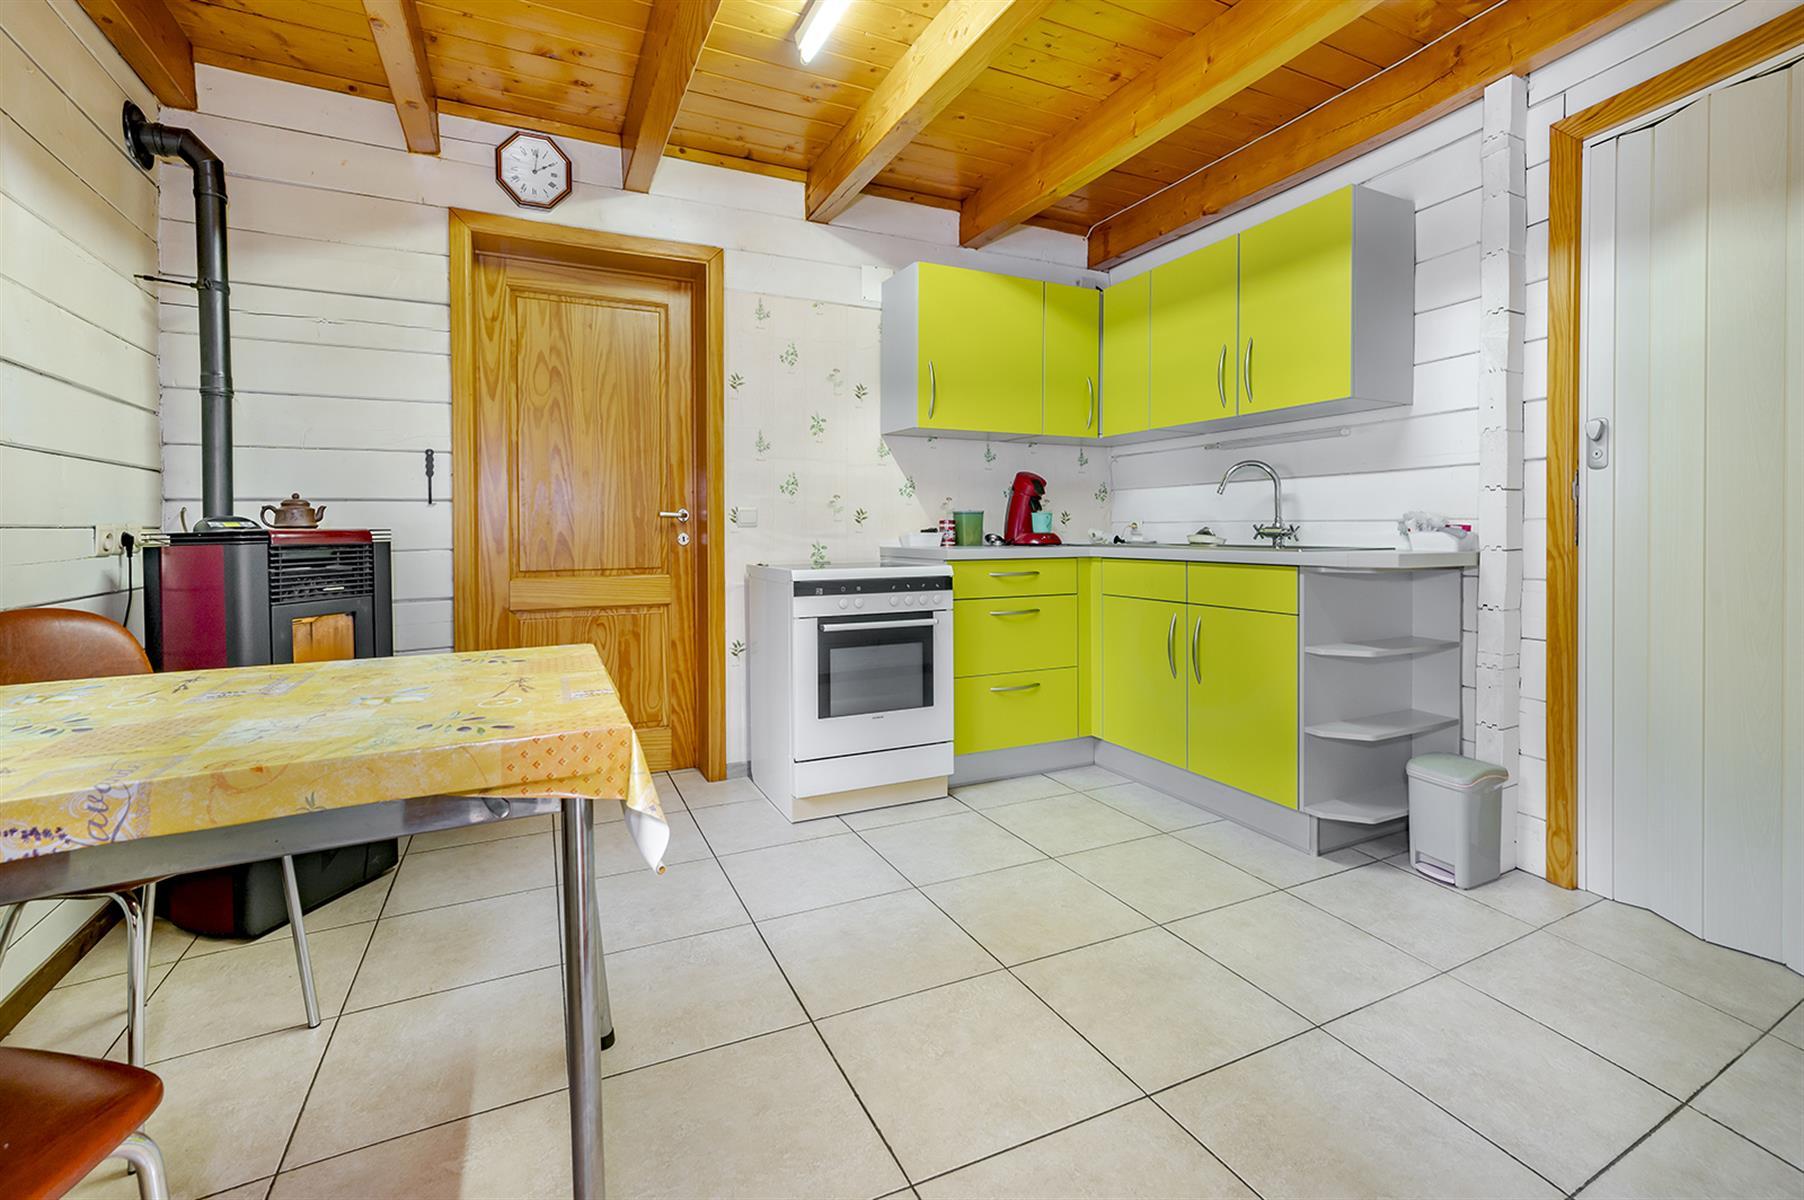 Maison - Berloz - #4189505-6